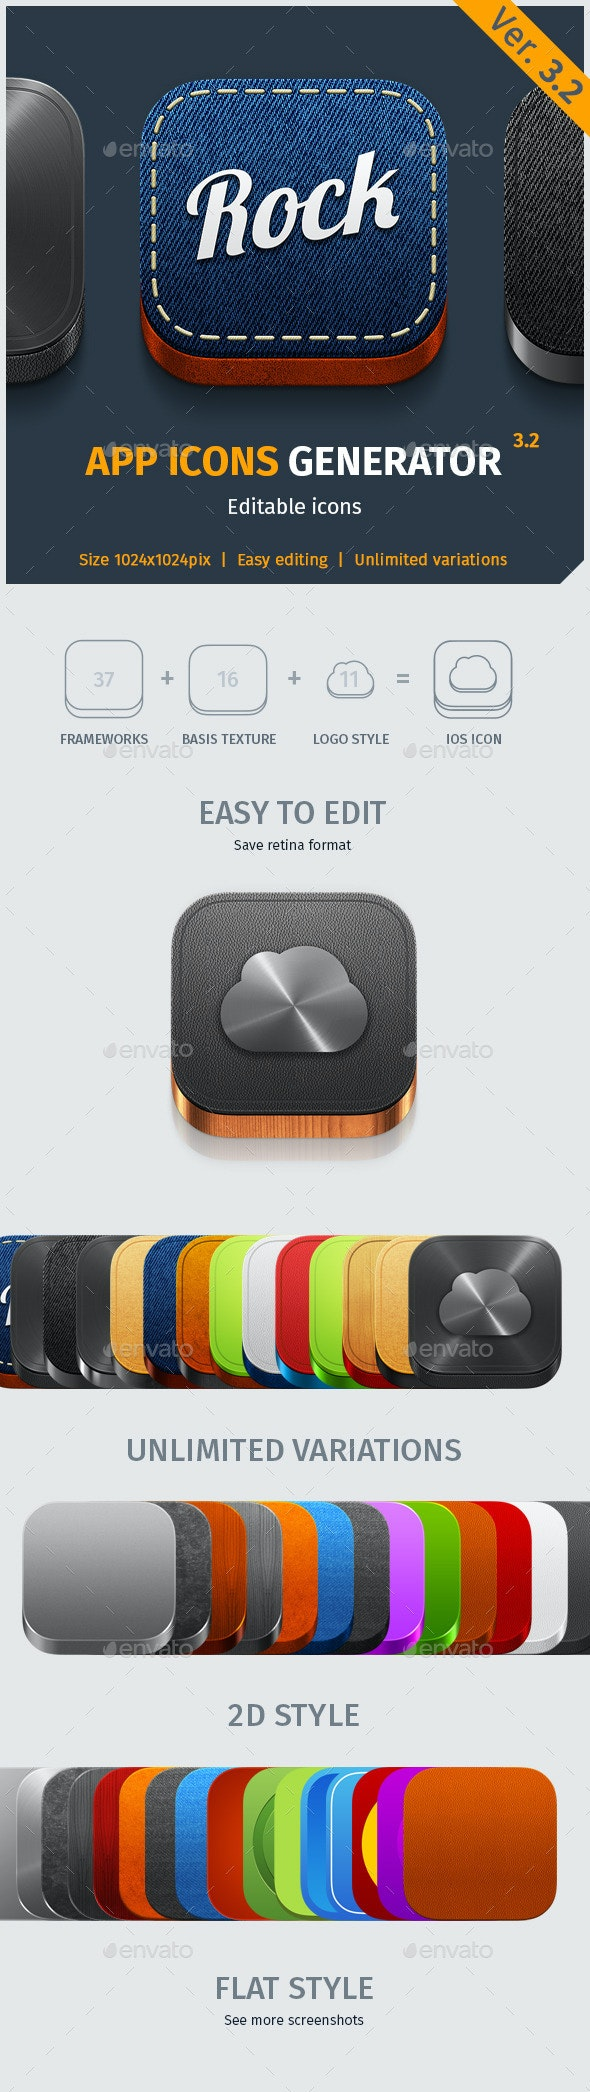 App Icon Generator V.3.2 - Software Icons